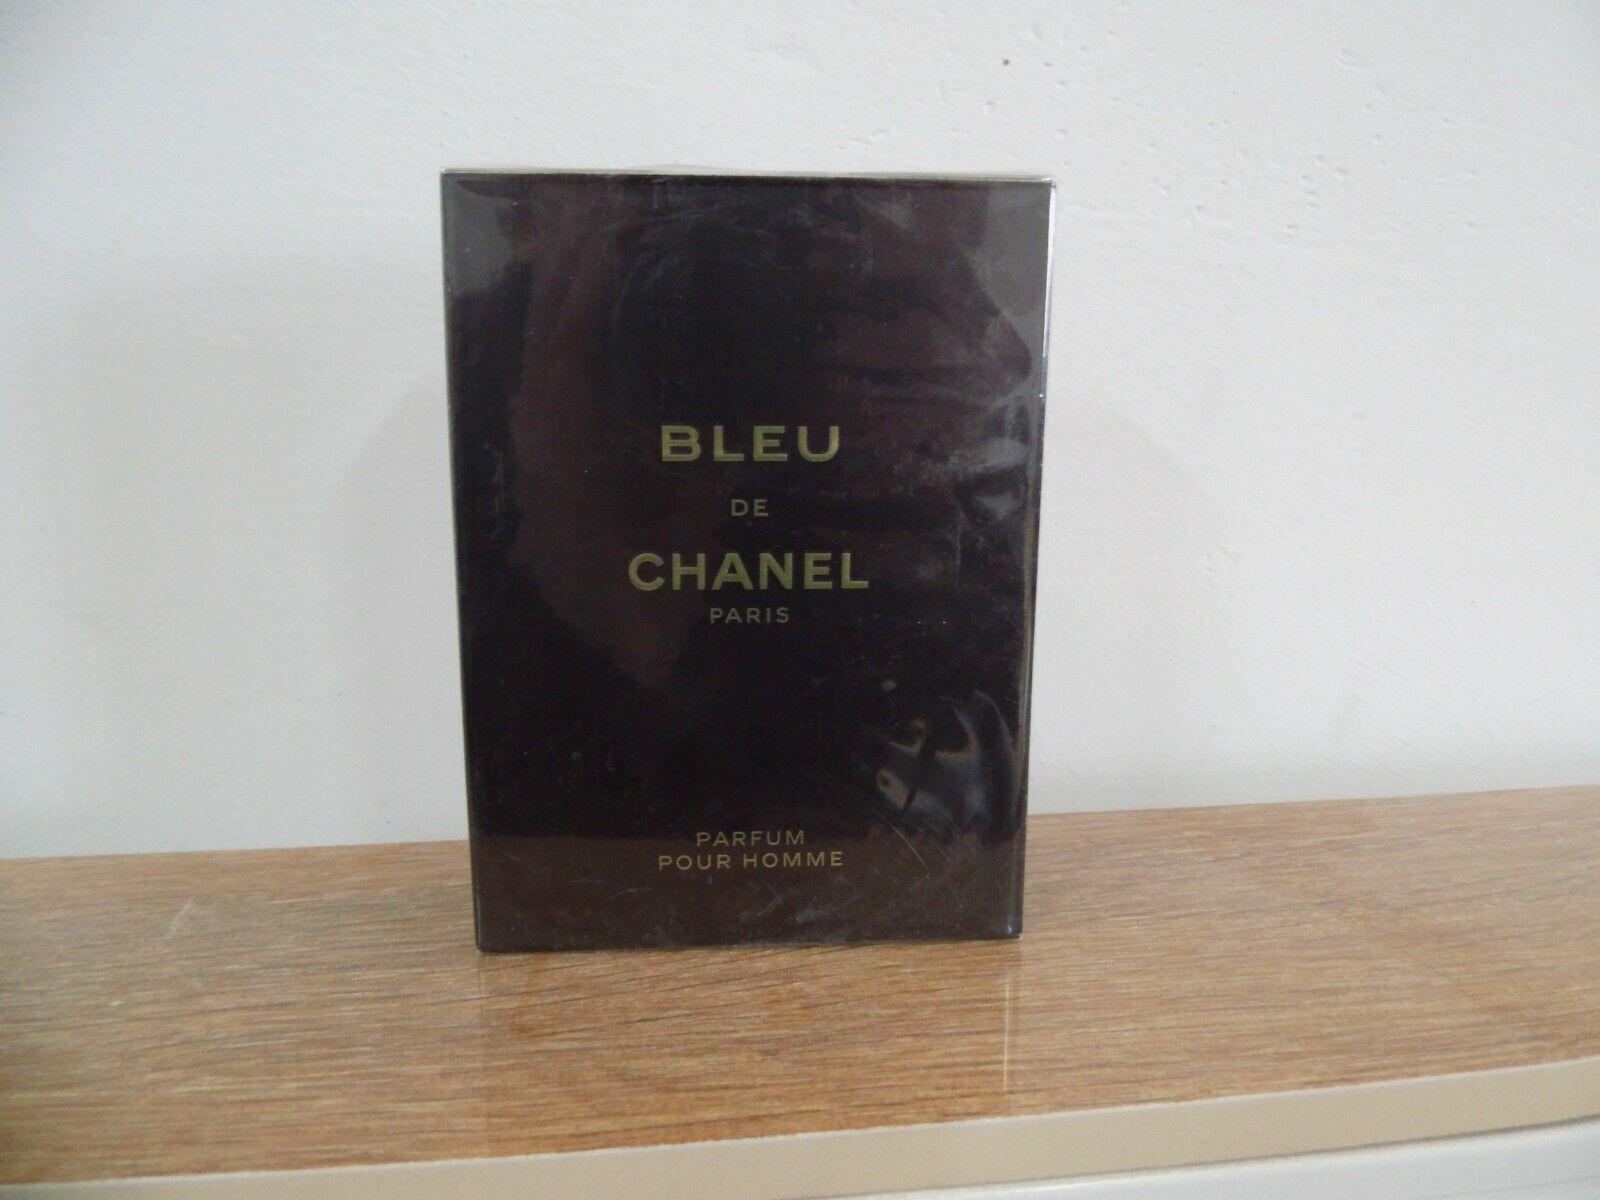 CHANEL BLEU DE CHANEL Eau de Parfum Spray für Herren - 100ml